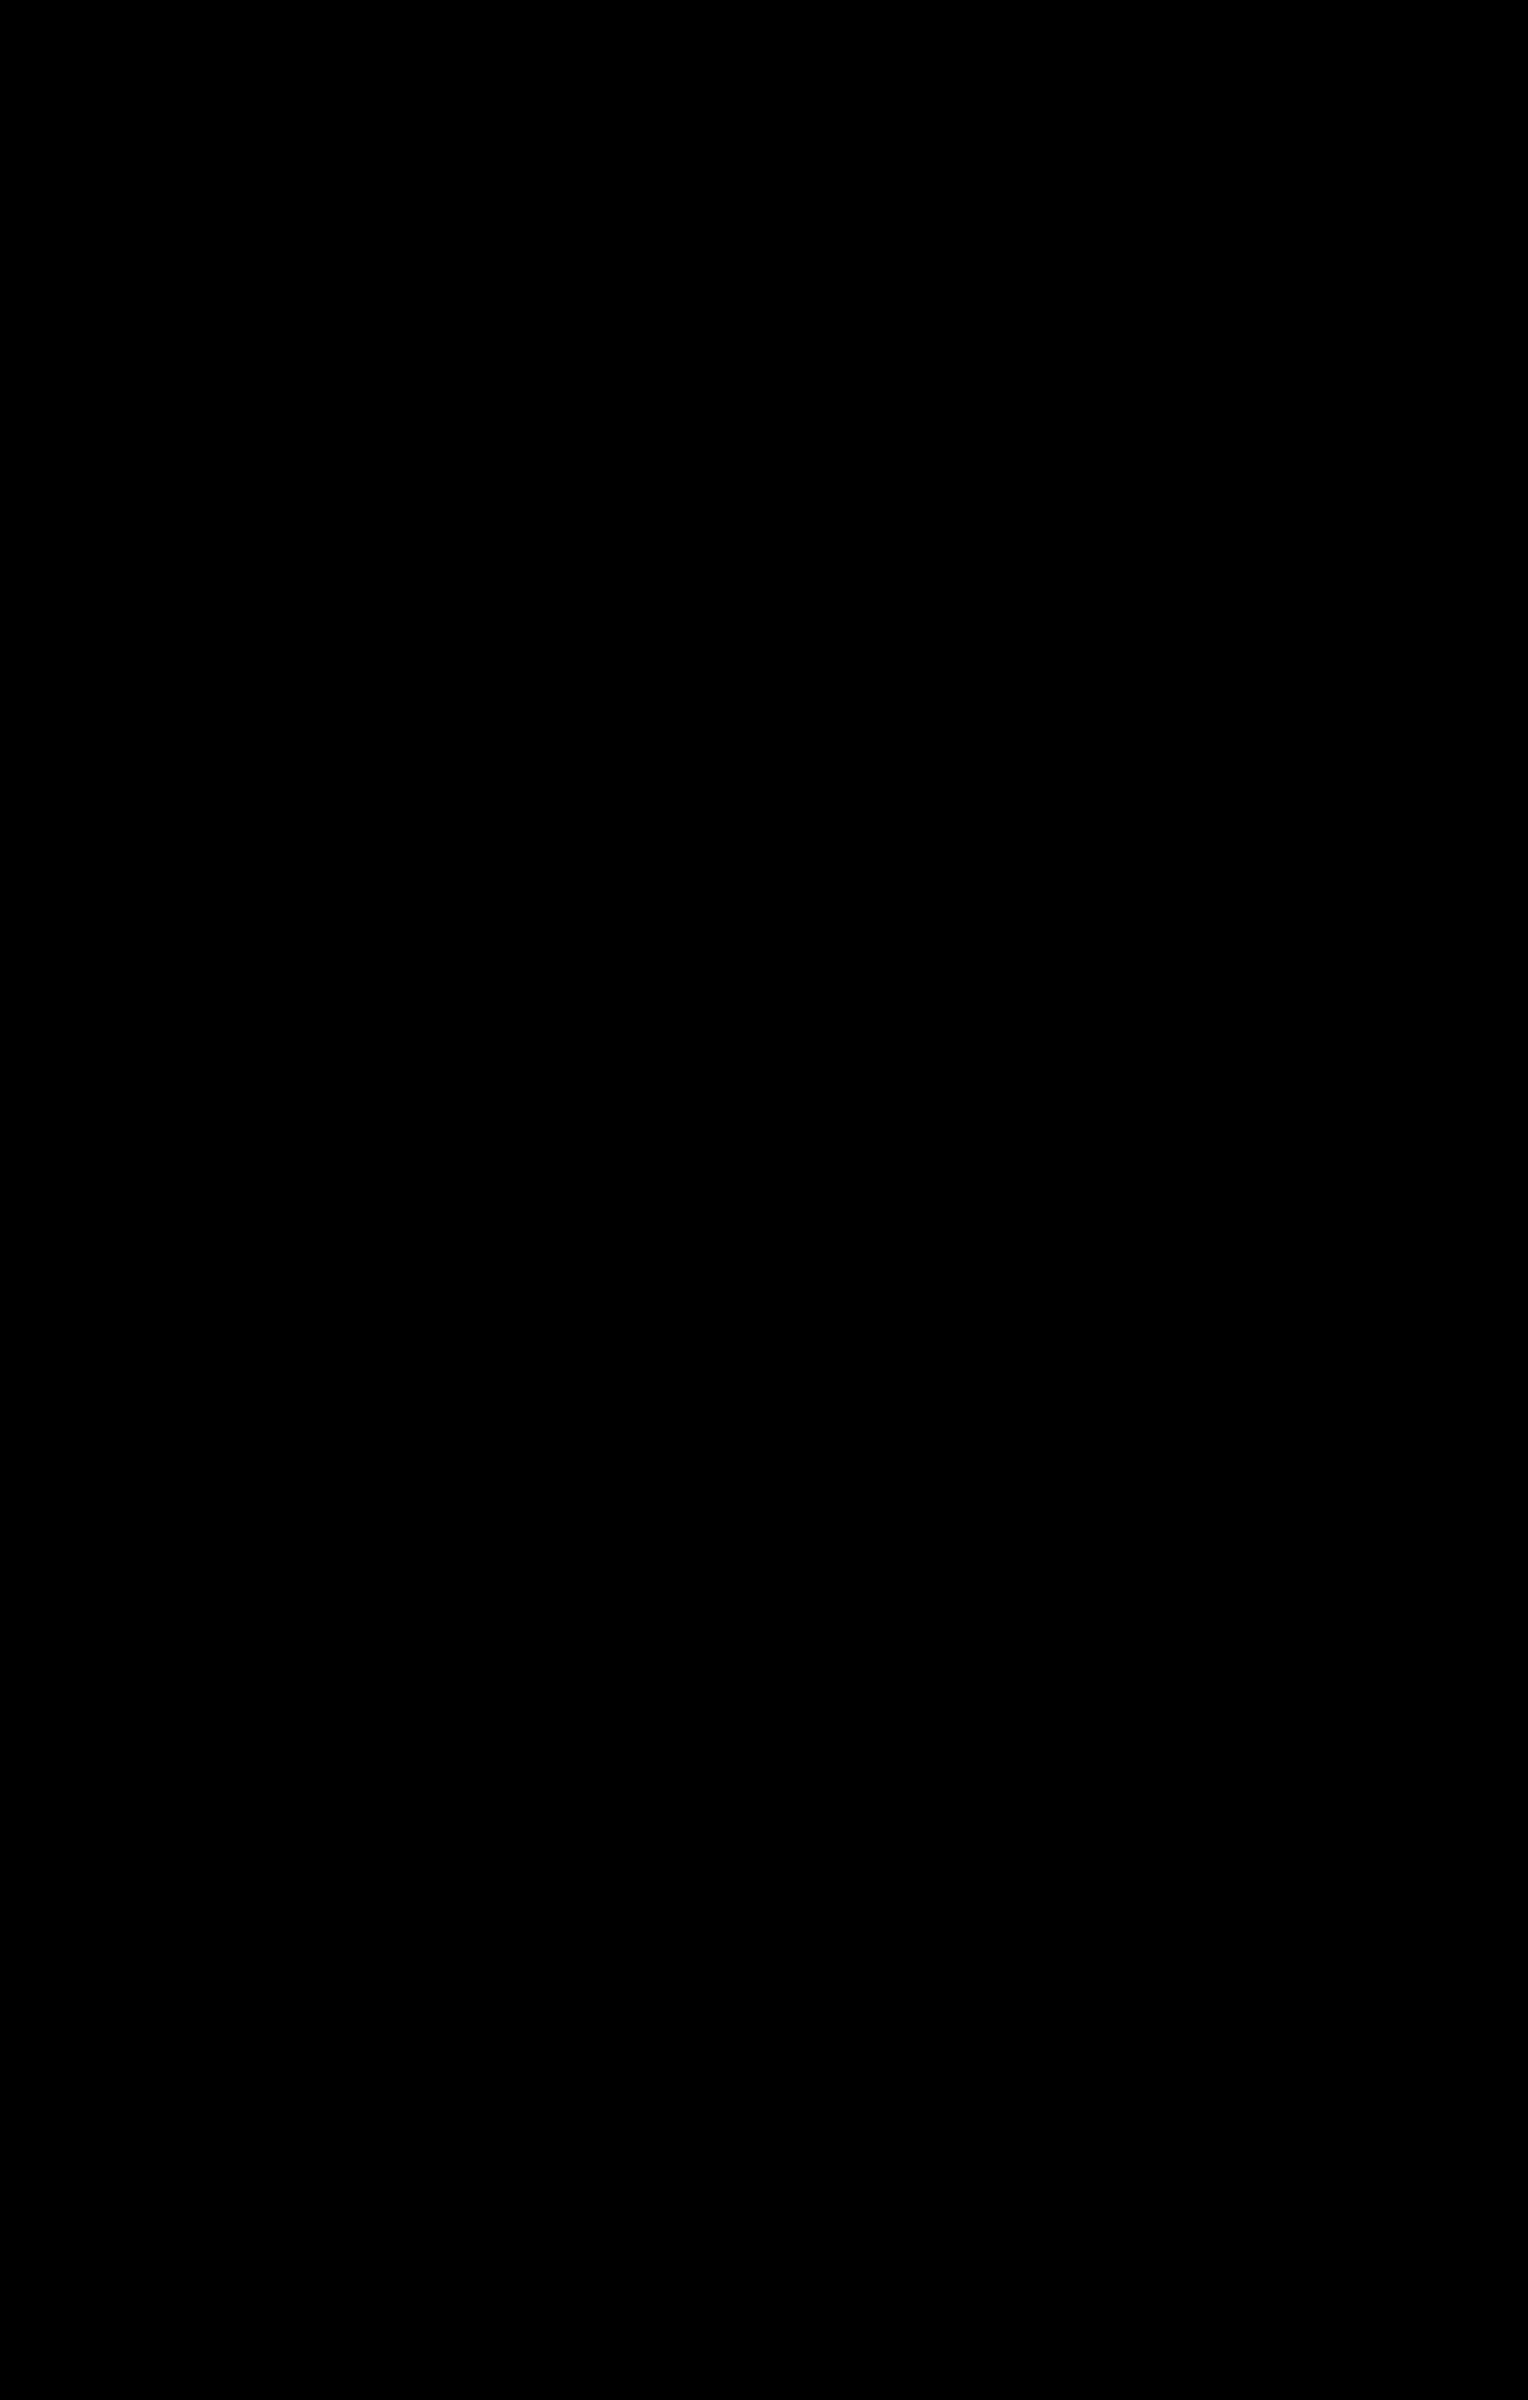 clipart transparent stock Clipart